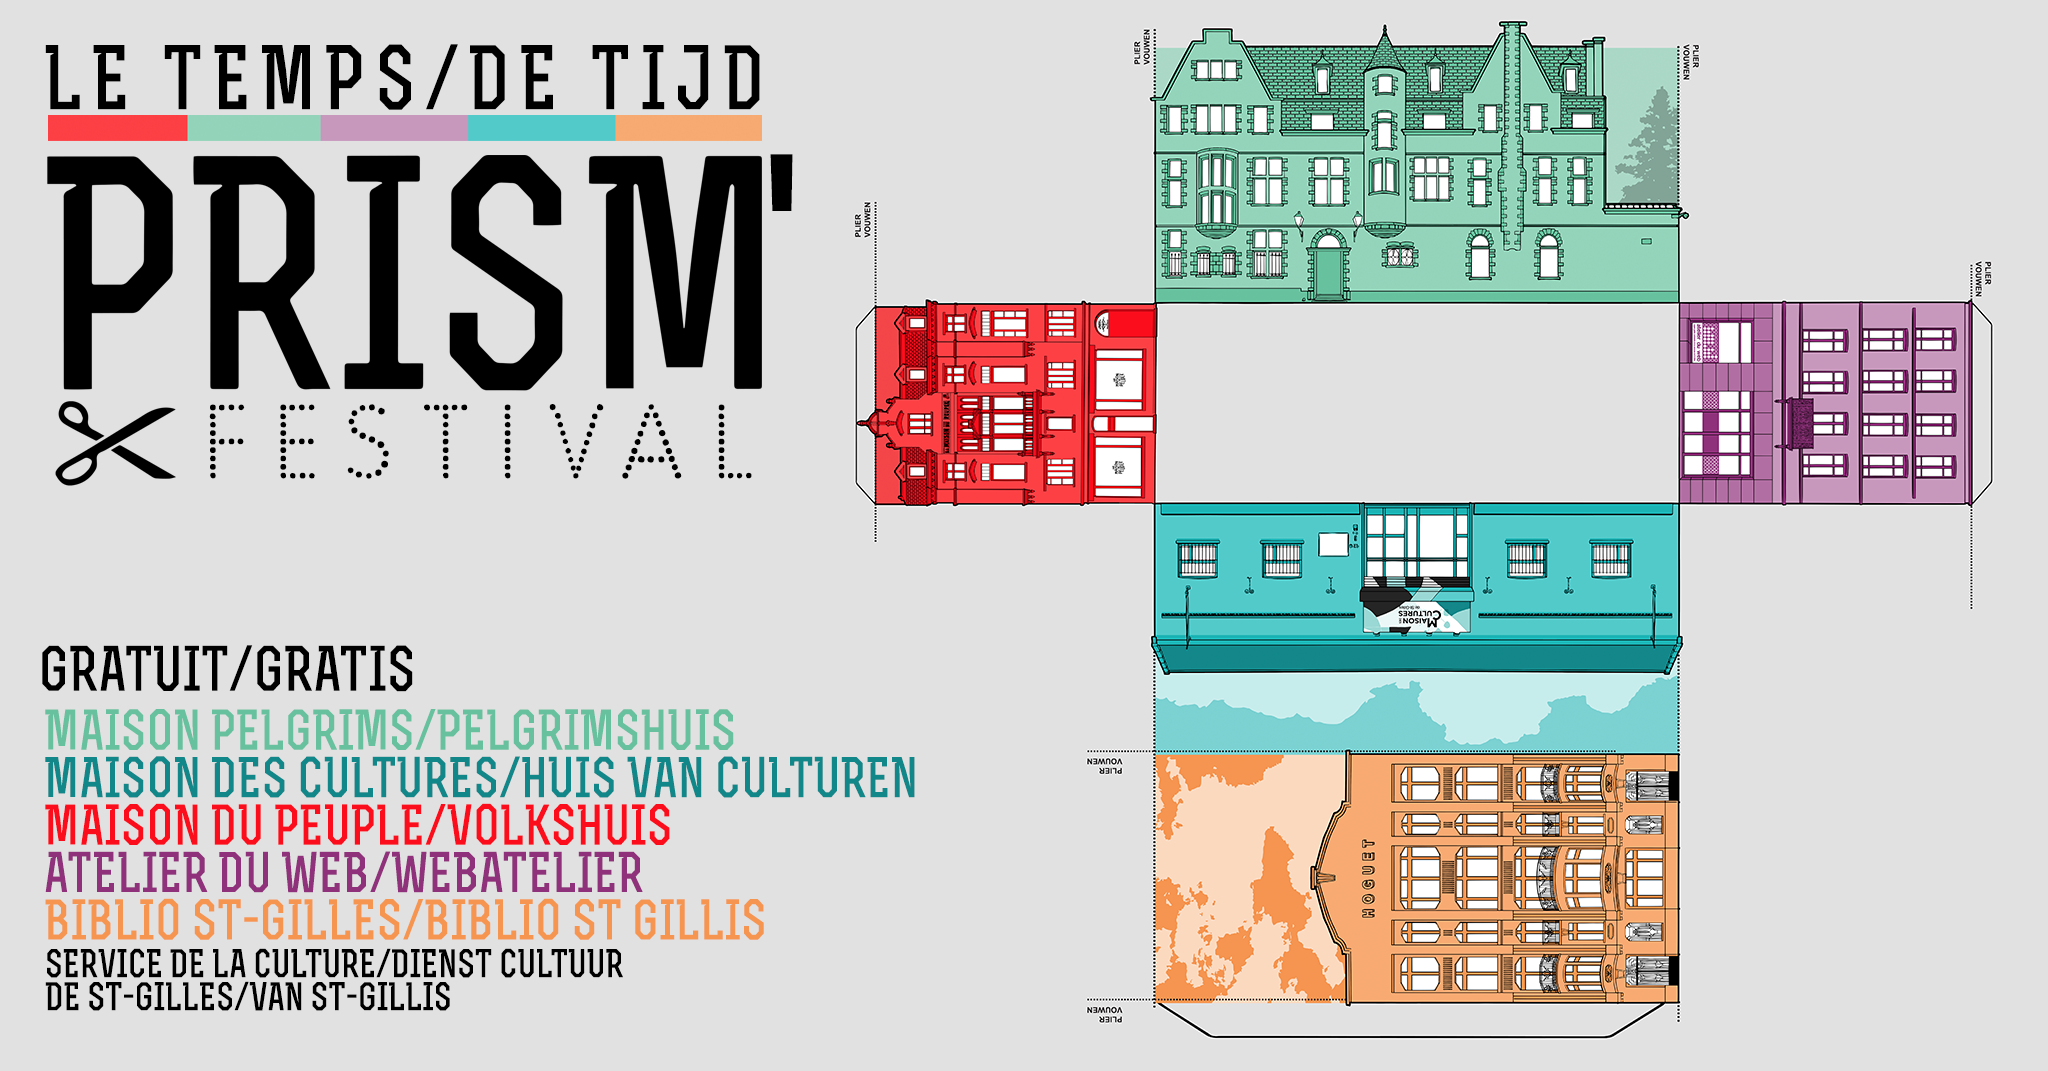 affiche prism' festival